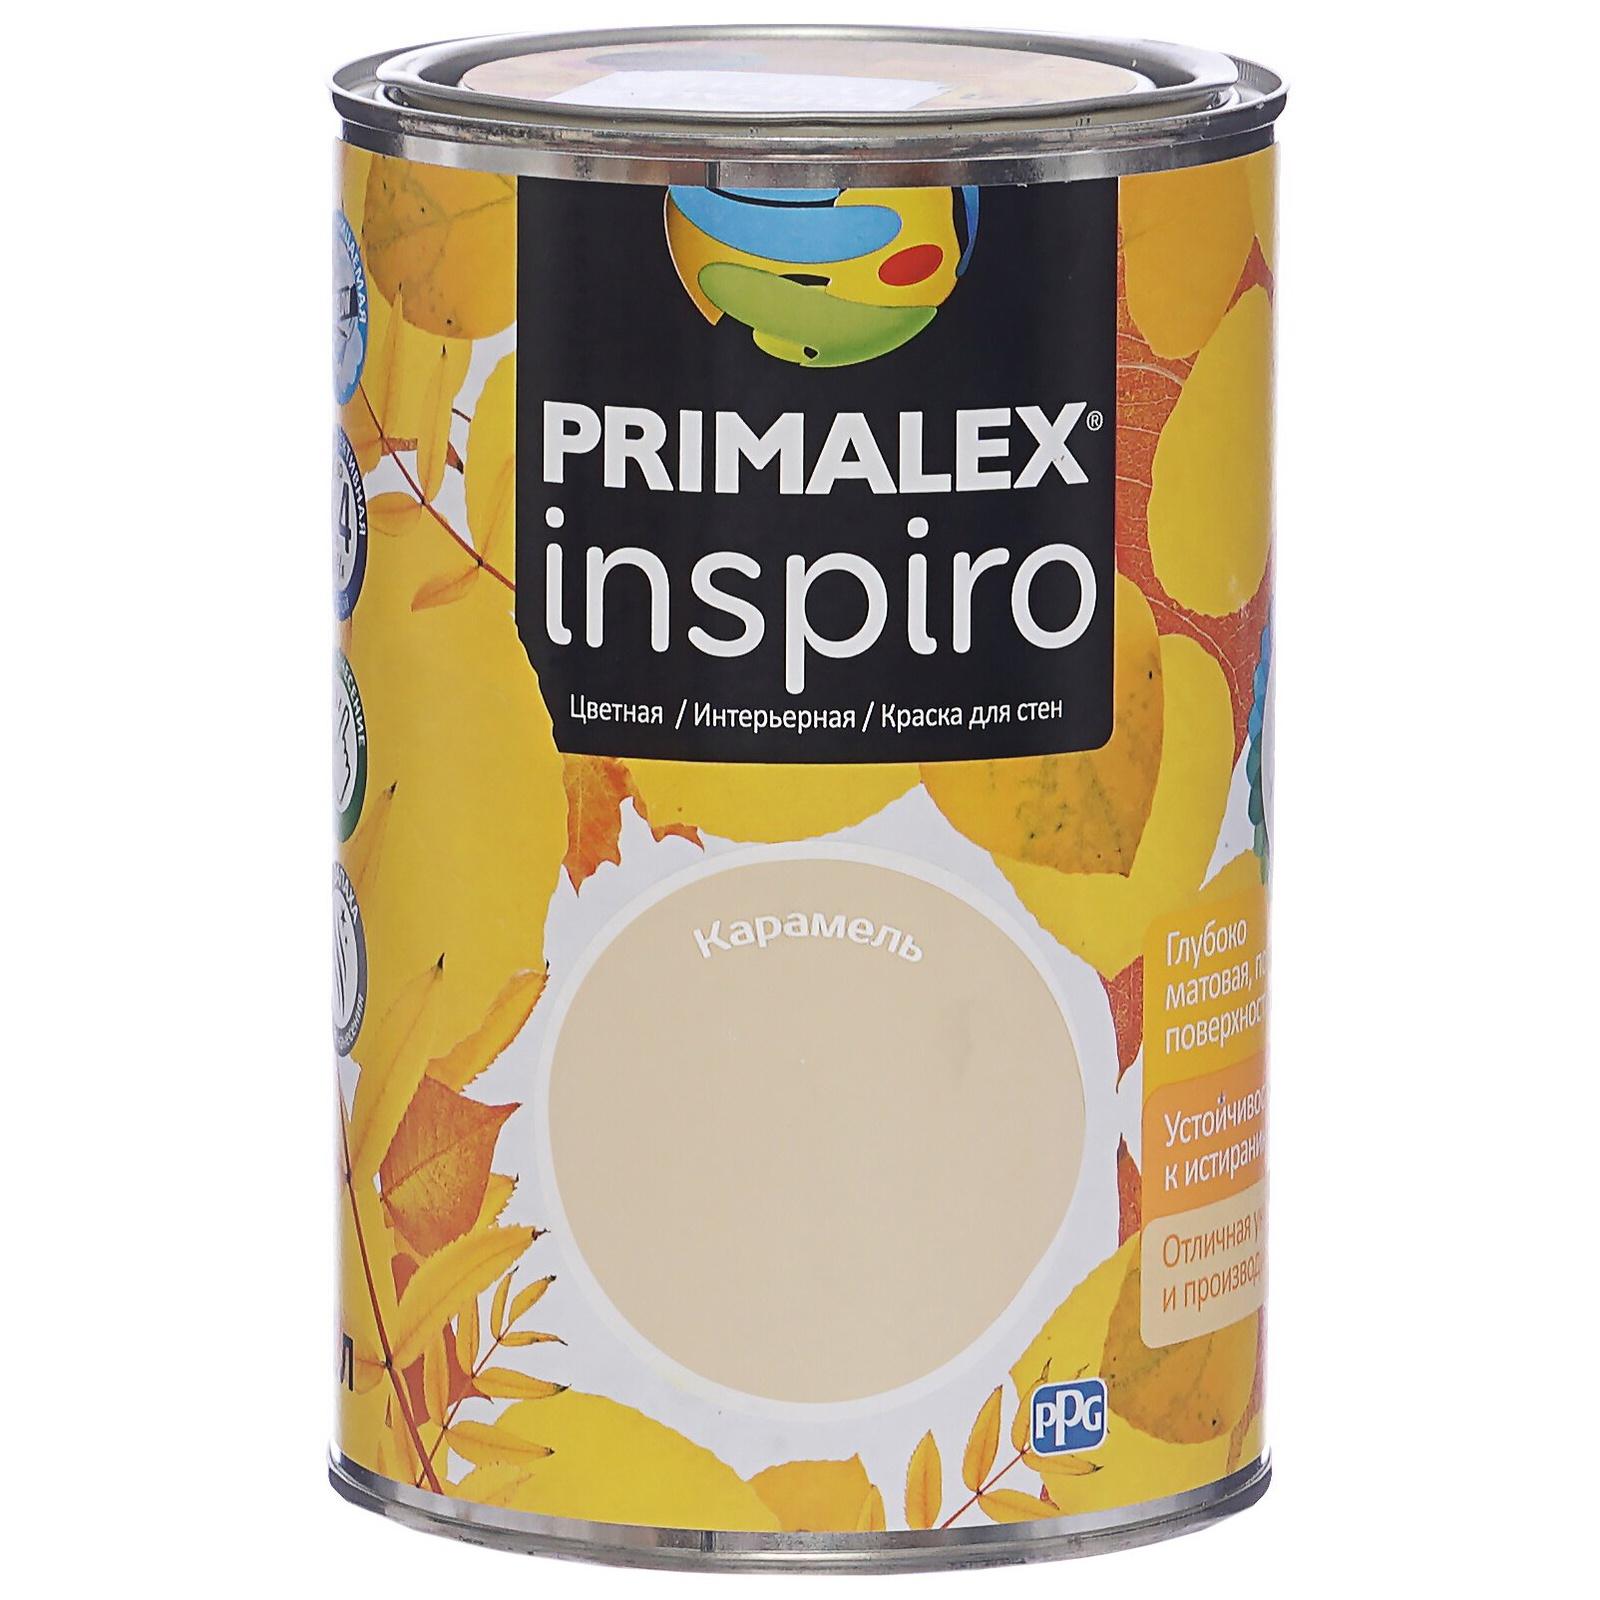 Краска PPG Primalex Inspiro Карамель 1л, 420106